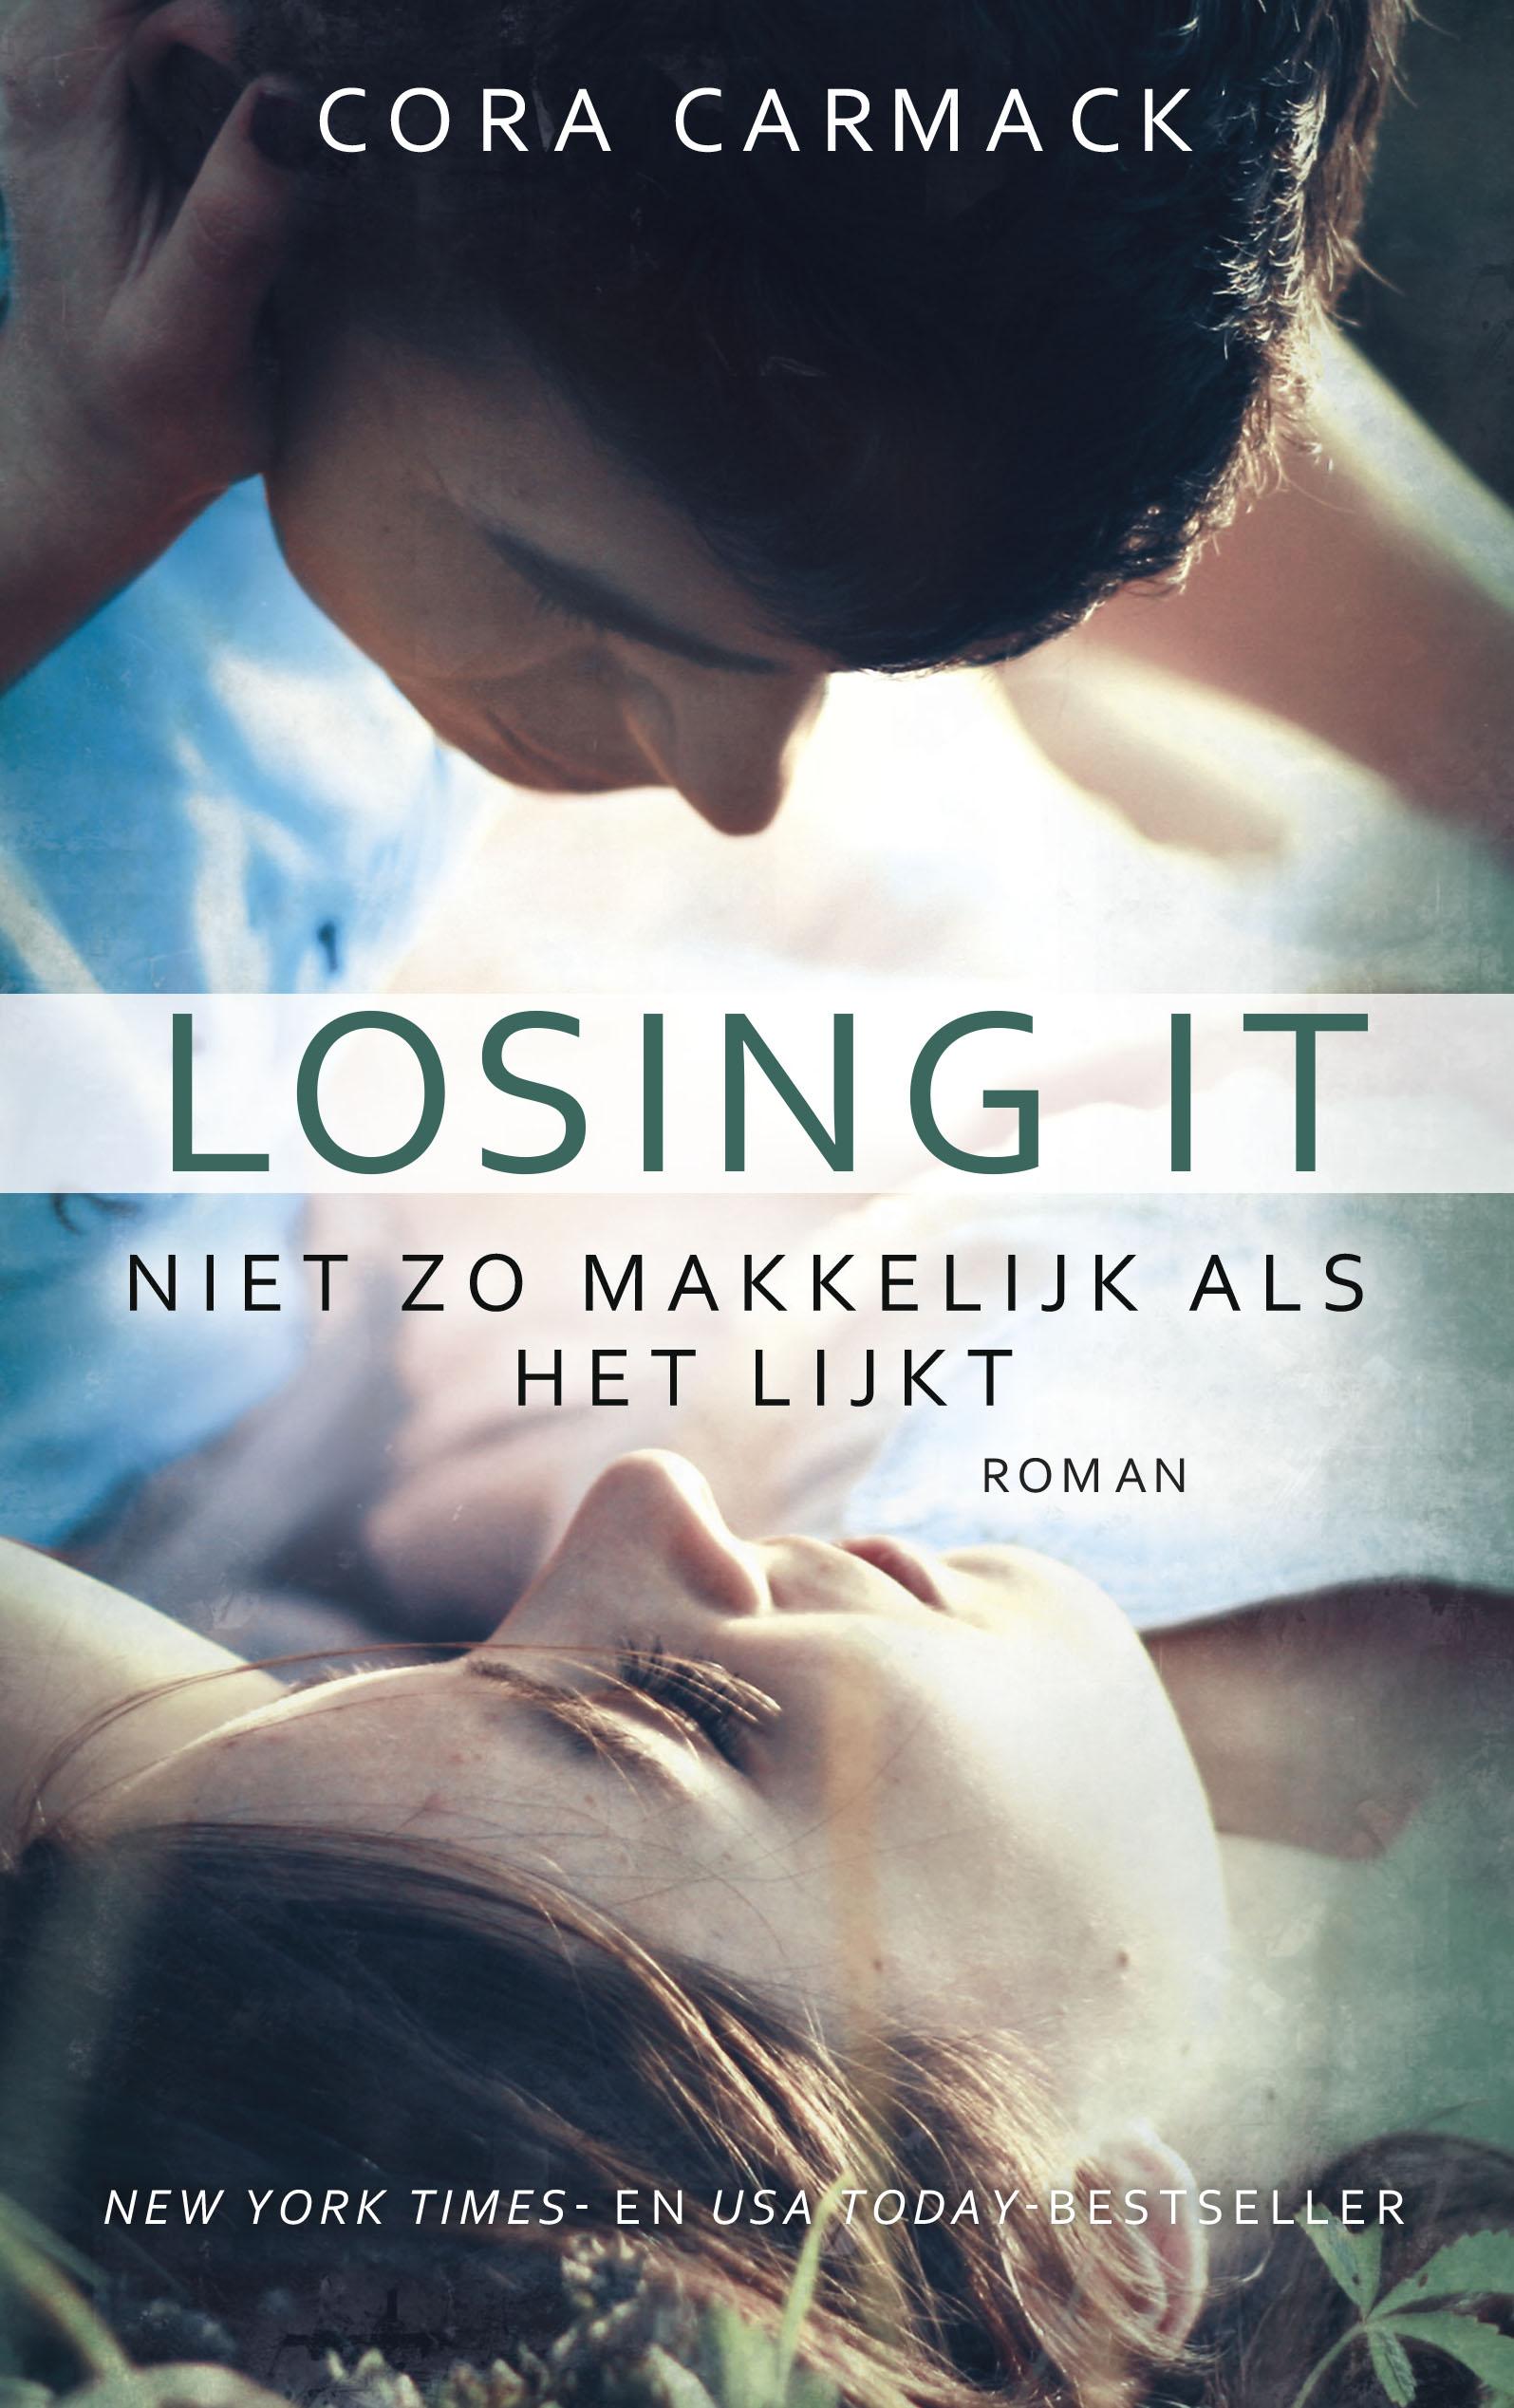 Losing it – Cora Carmack